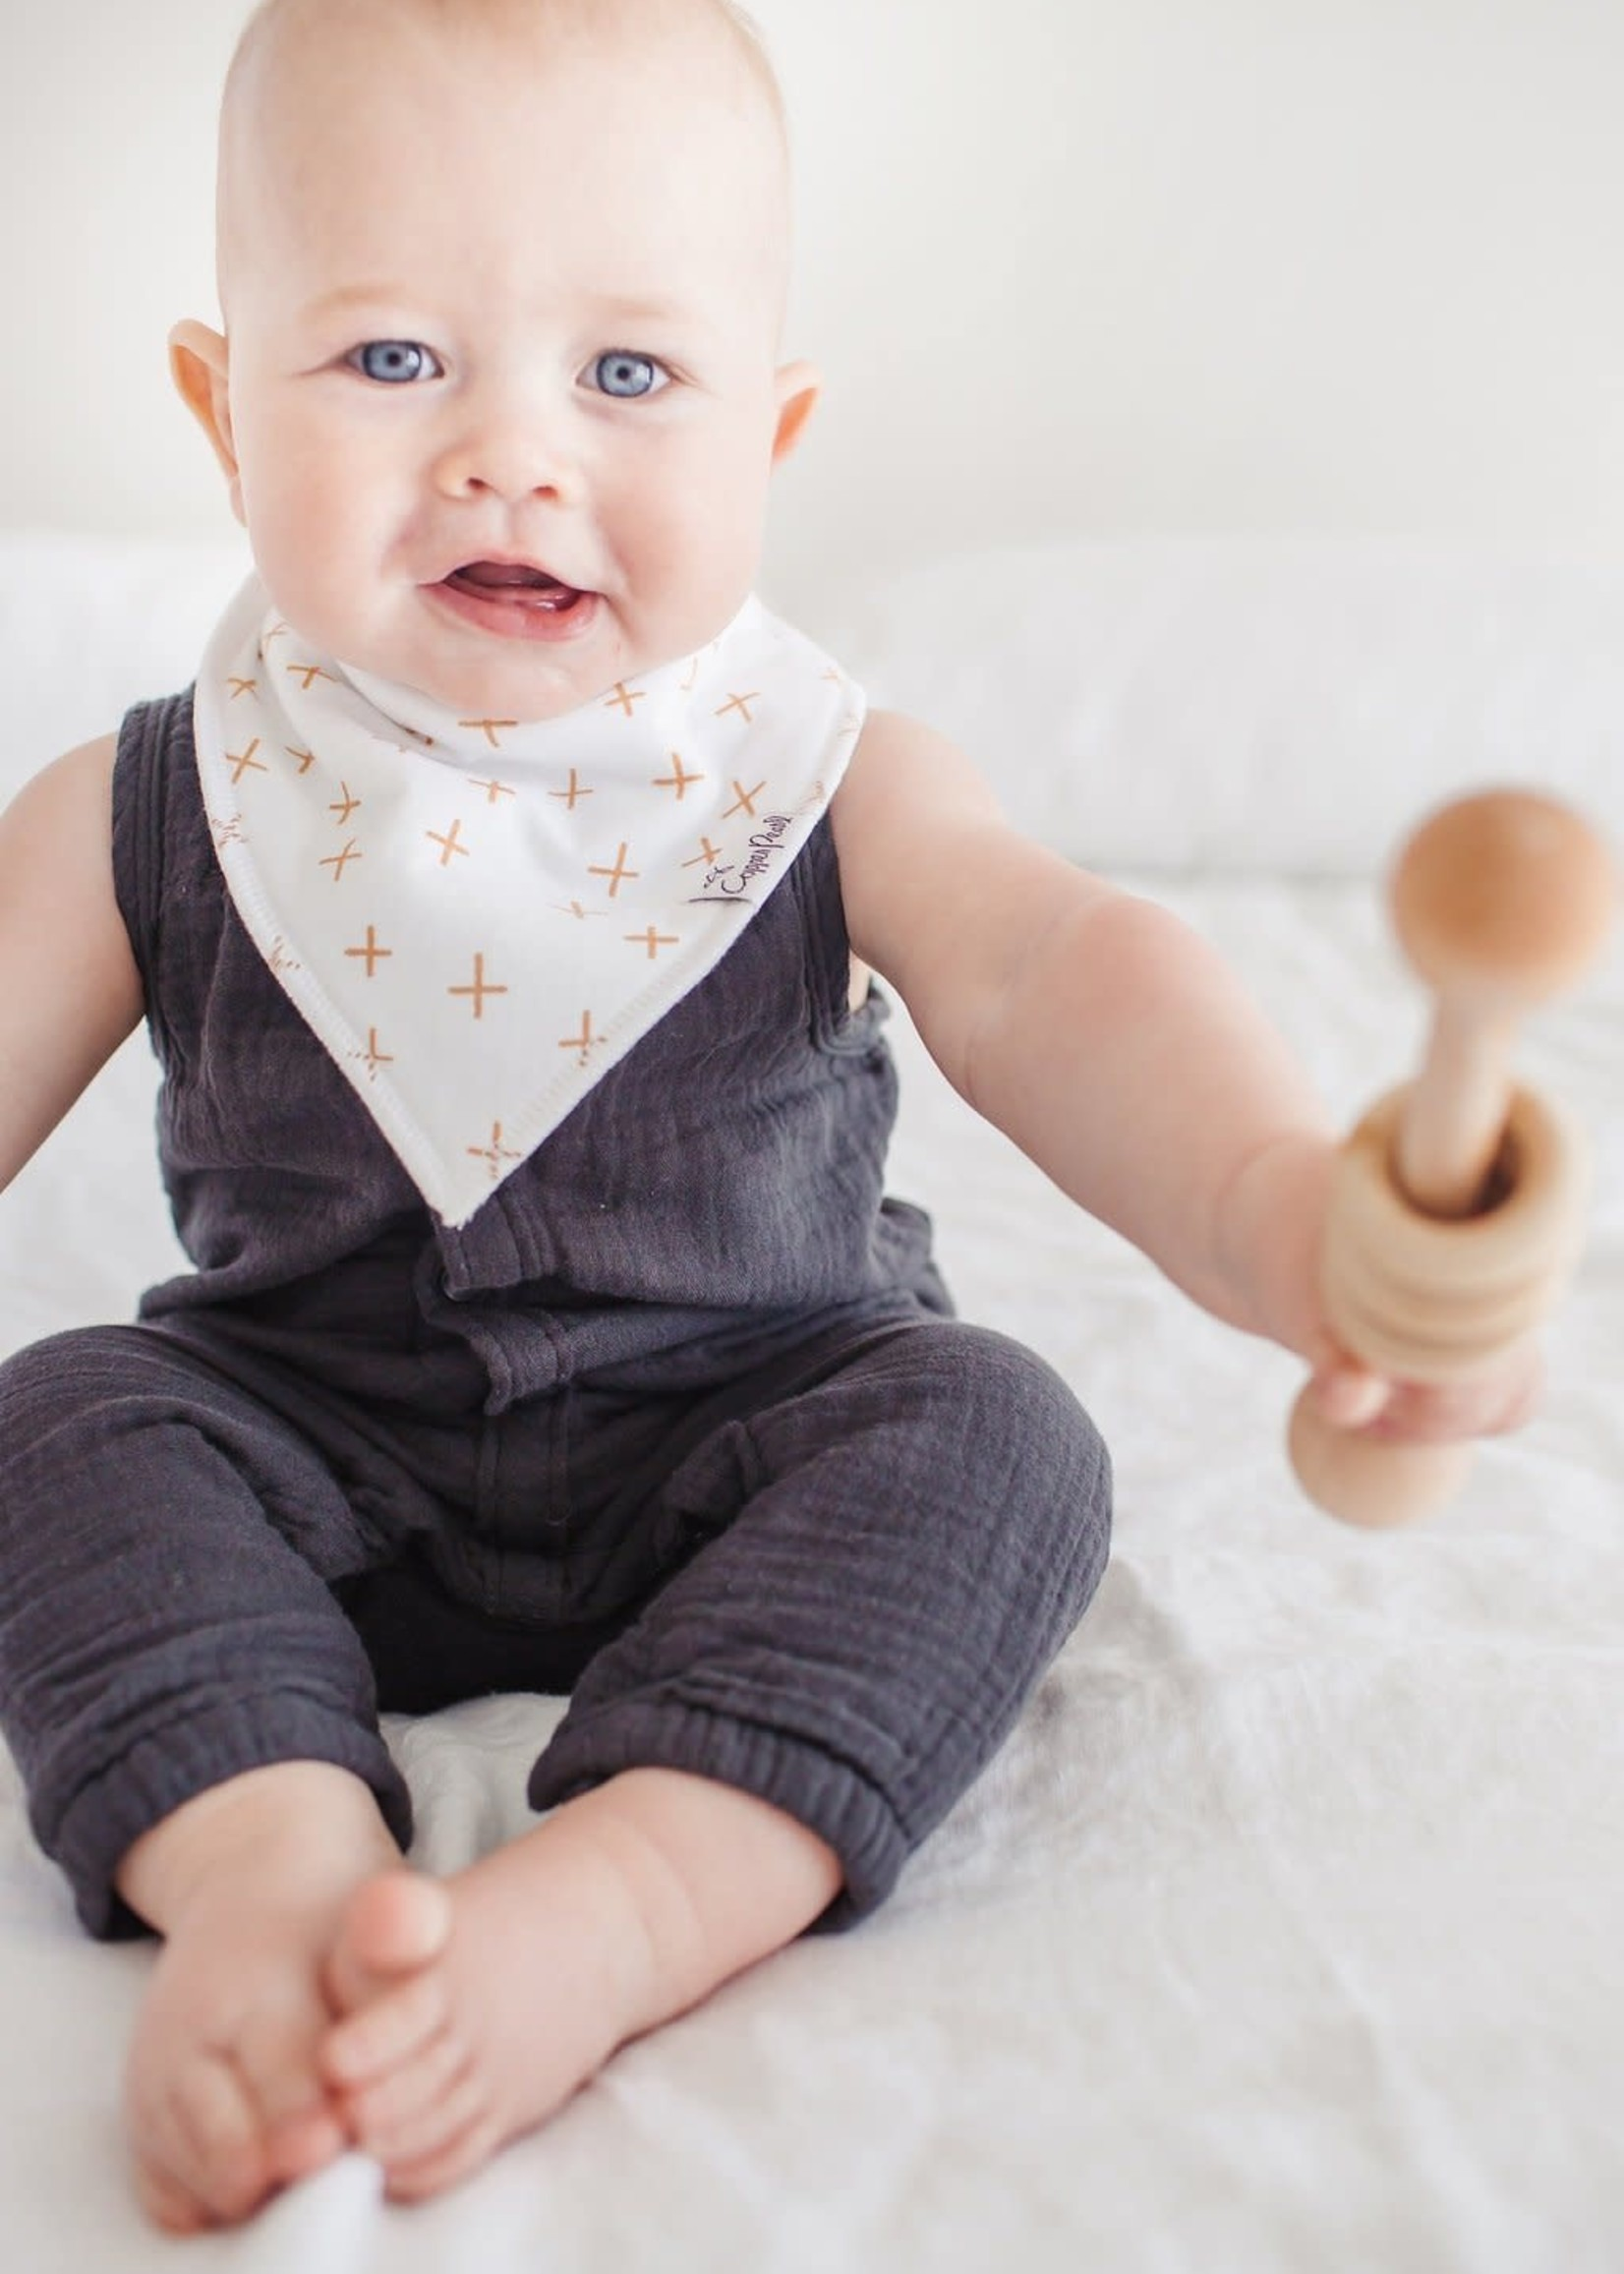 COPPER PEARL 4-pack Baby Bandana Bibs CHIP